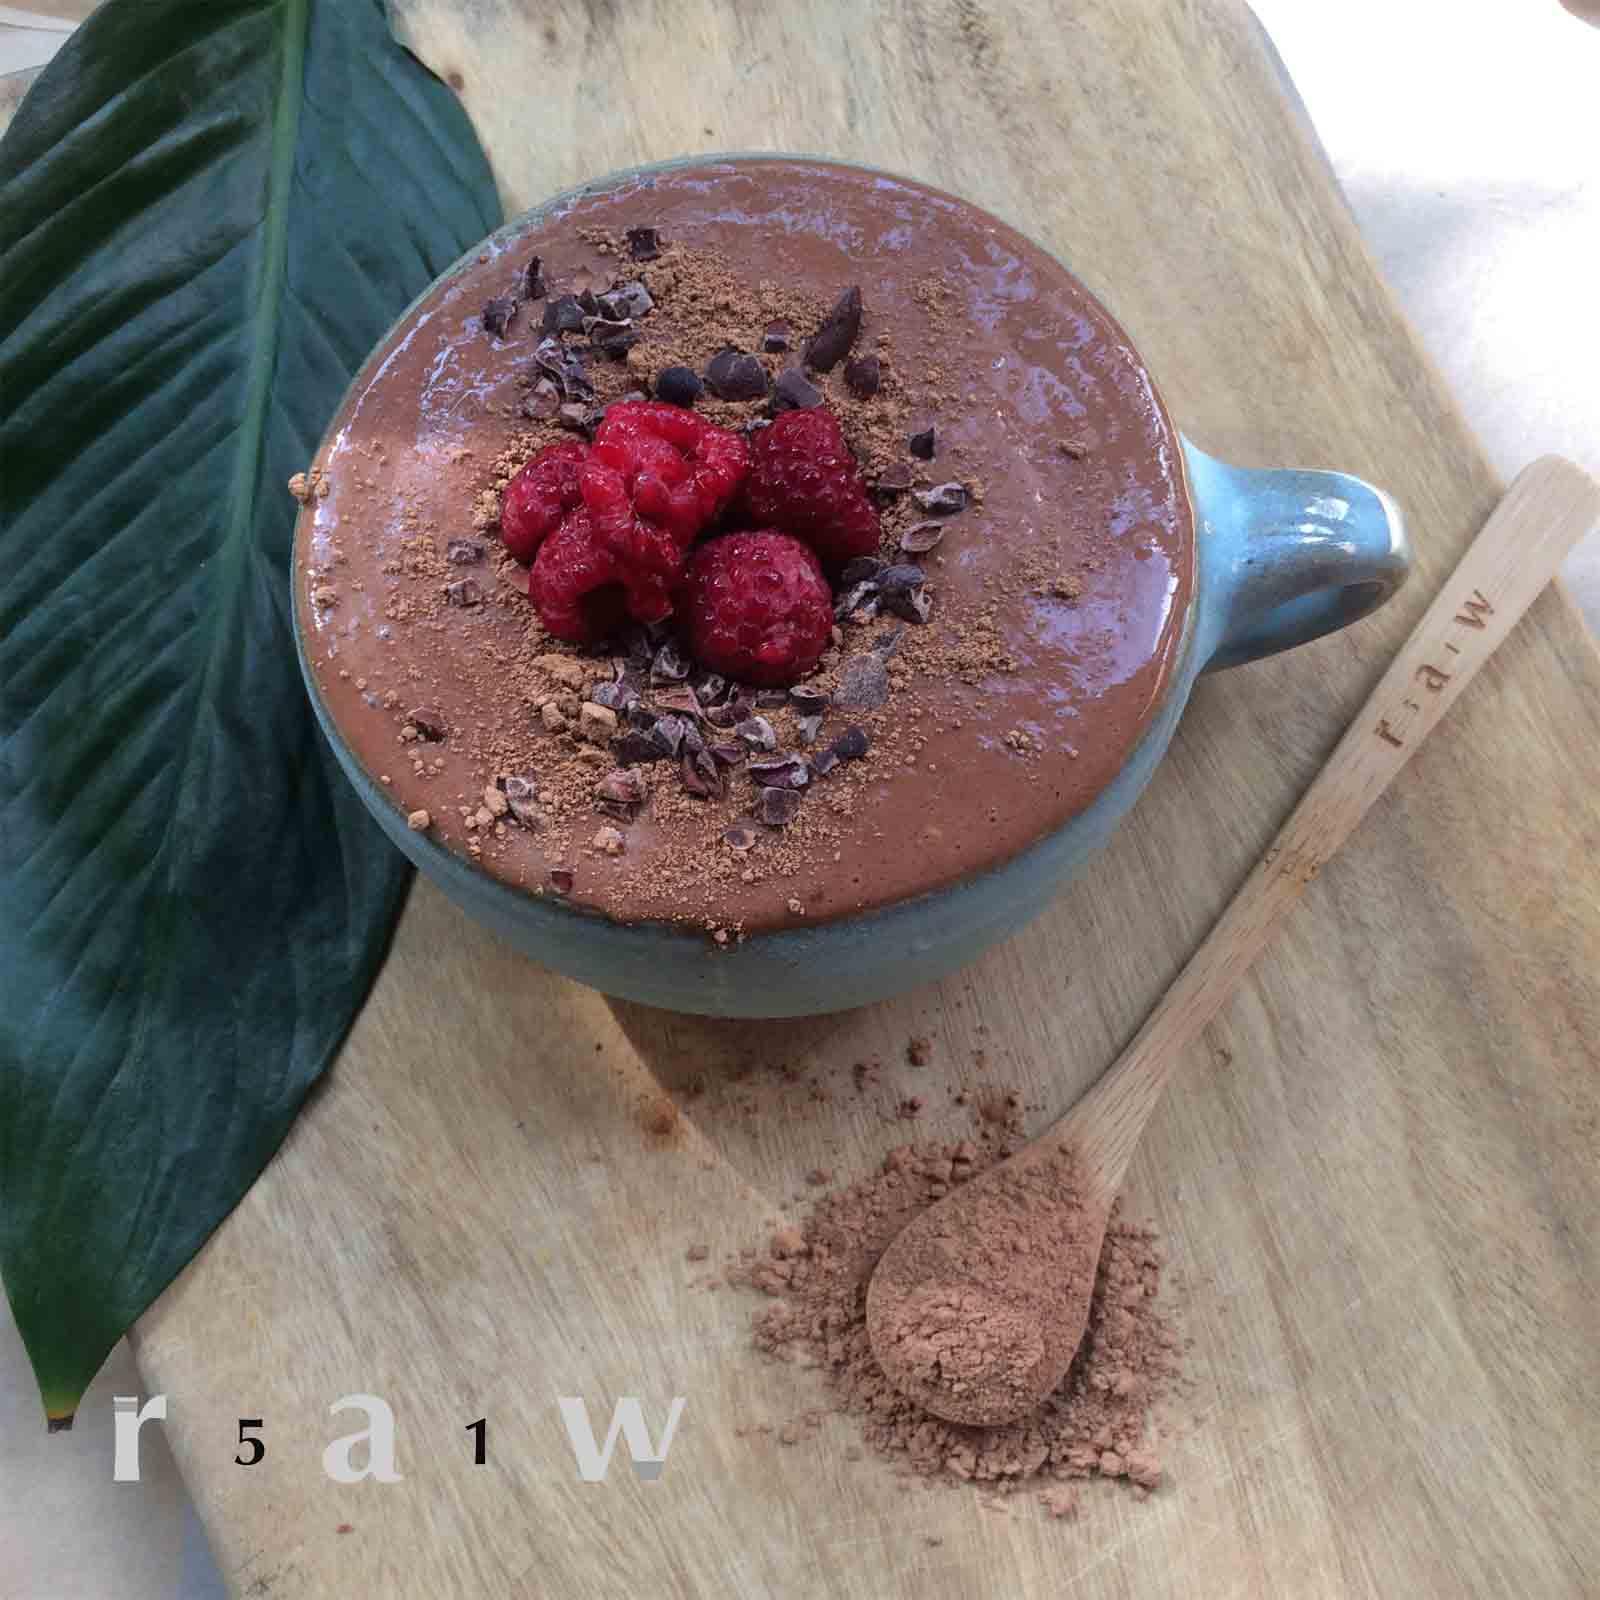 raw-food-diet-raspberry-chocolate-maca-smoothie-recipe-51raw.jpg